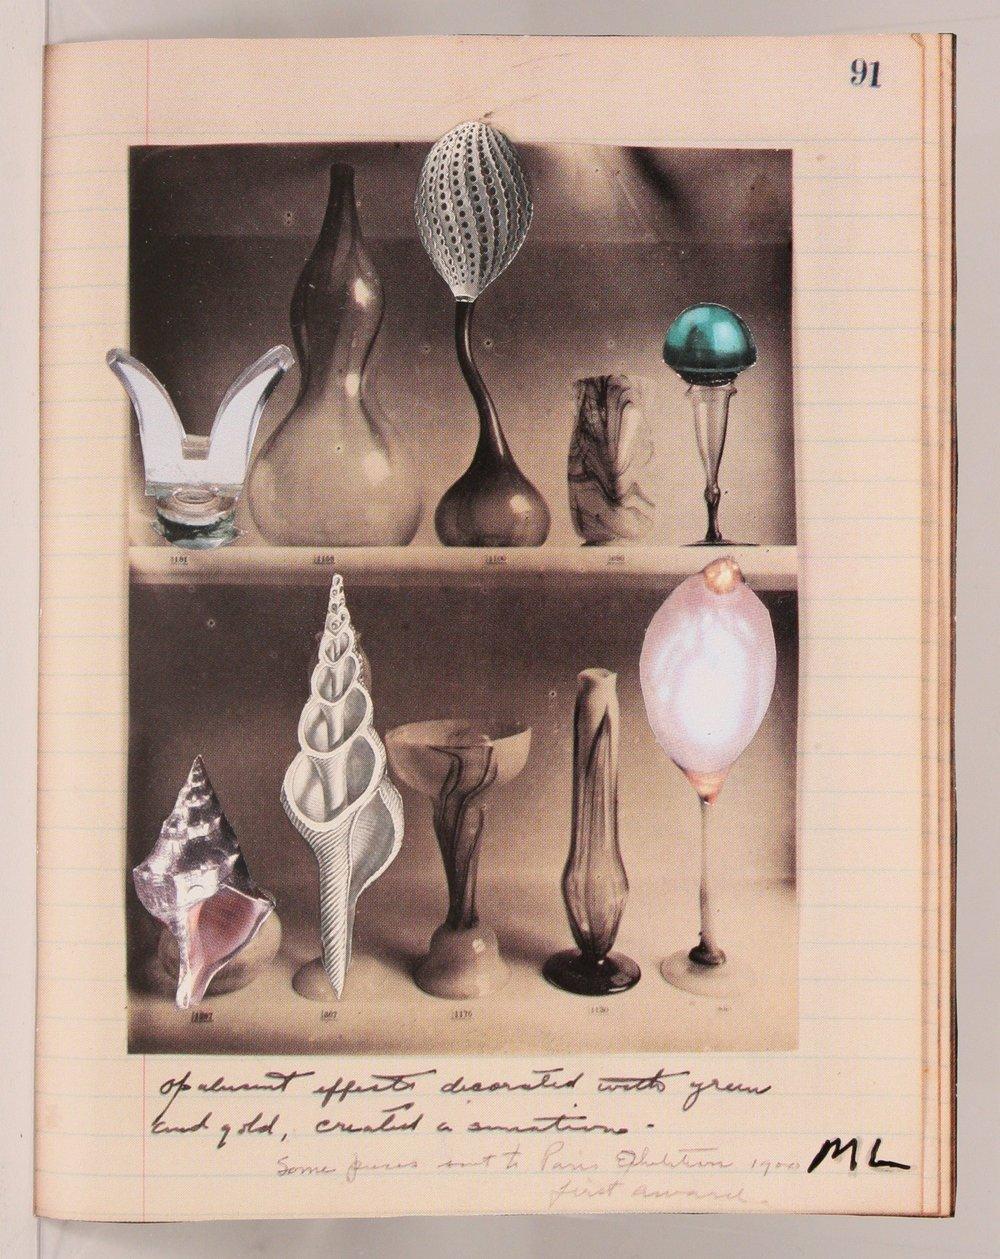 Medicine Cabinet #5 by Mara Lefebvre